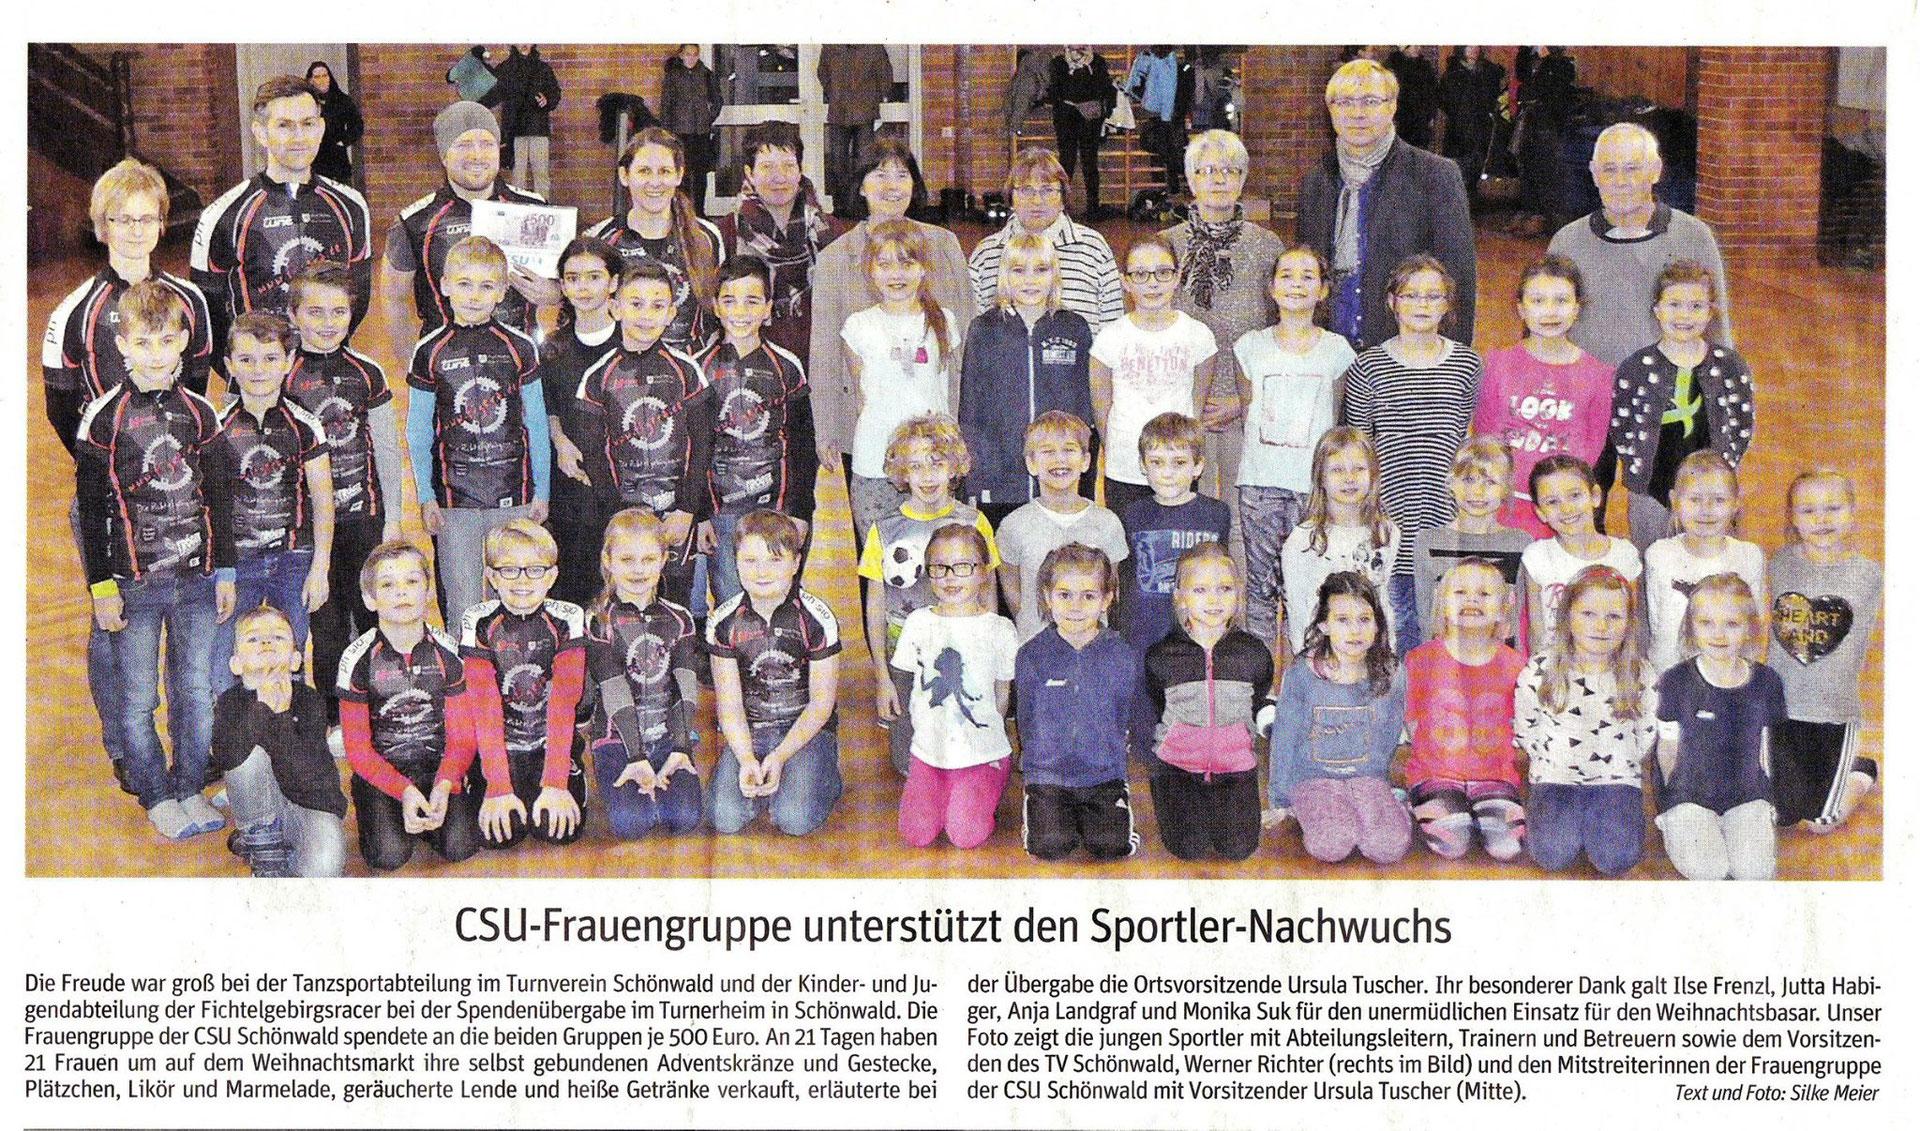 20 12 2017 CSU-Frauengruppe fördert den Sportler-Nachwuchs